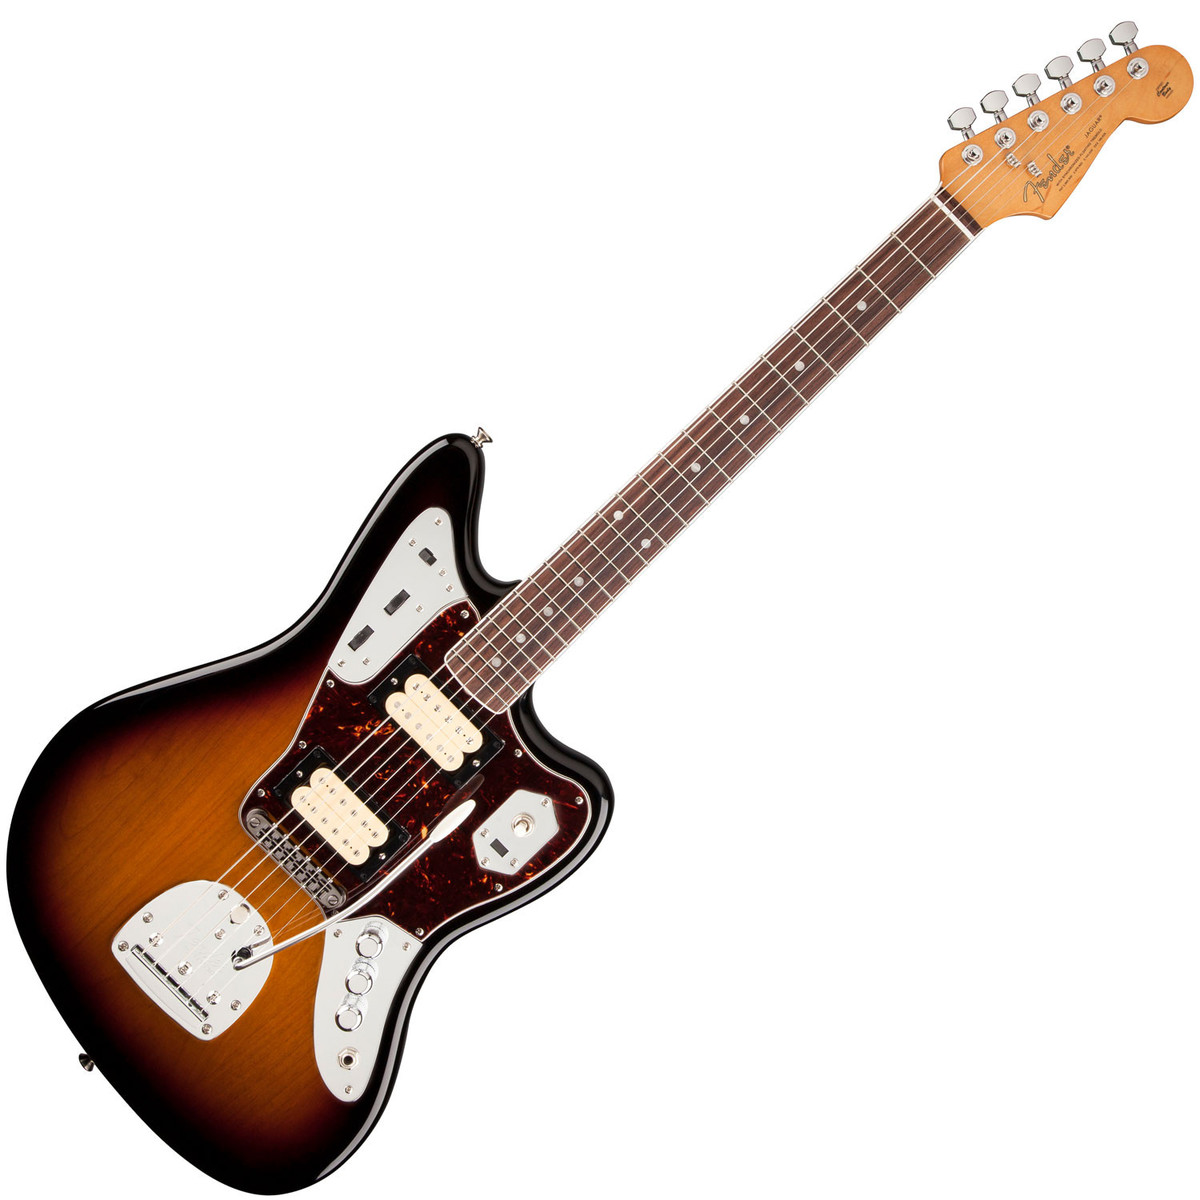 fender kurt cobain jaguar nos guitar, 3-tone sunburst - b-stock